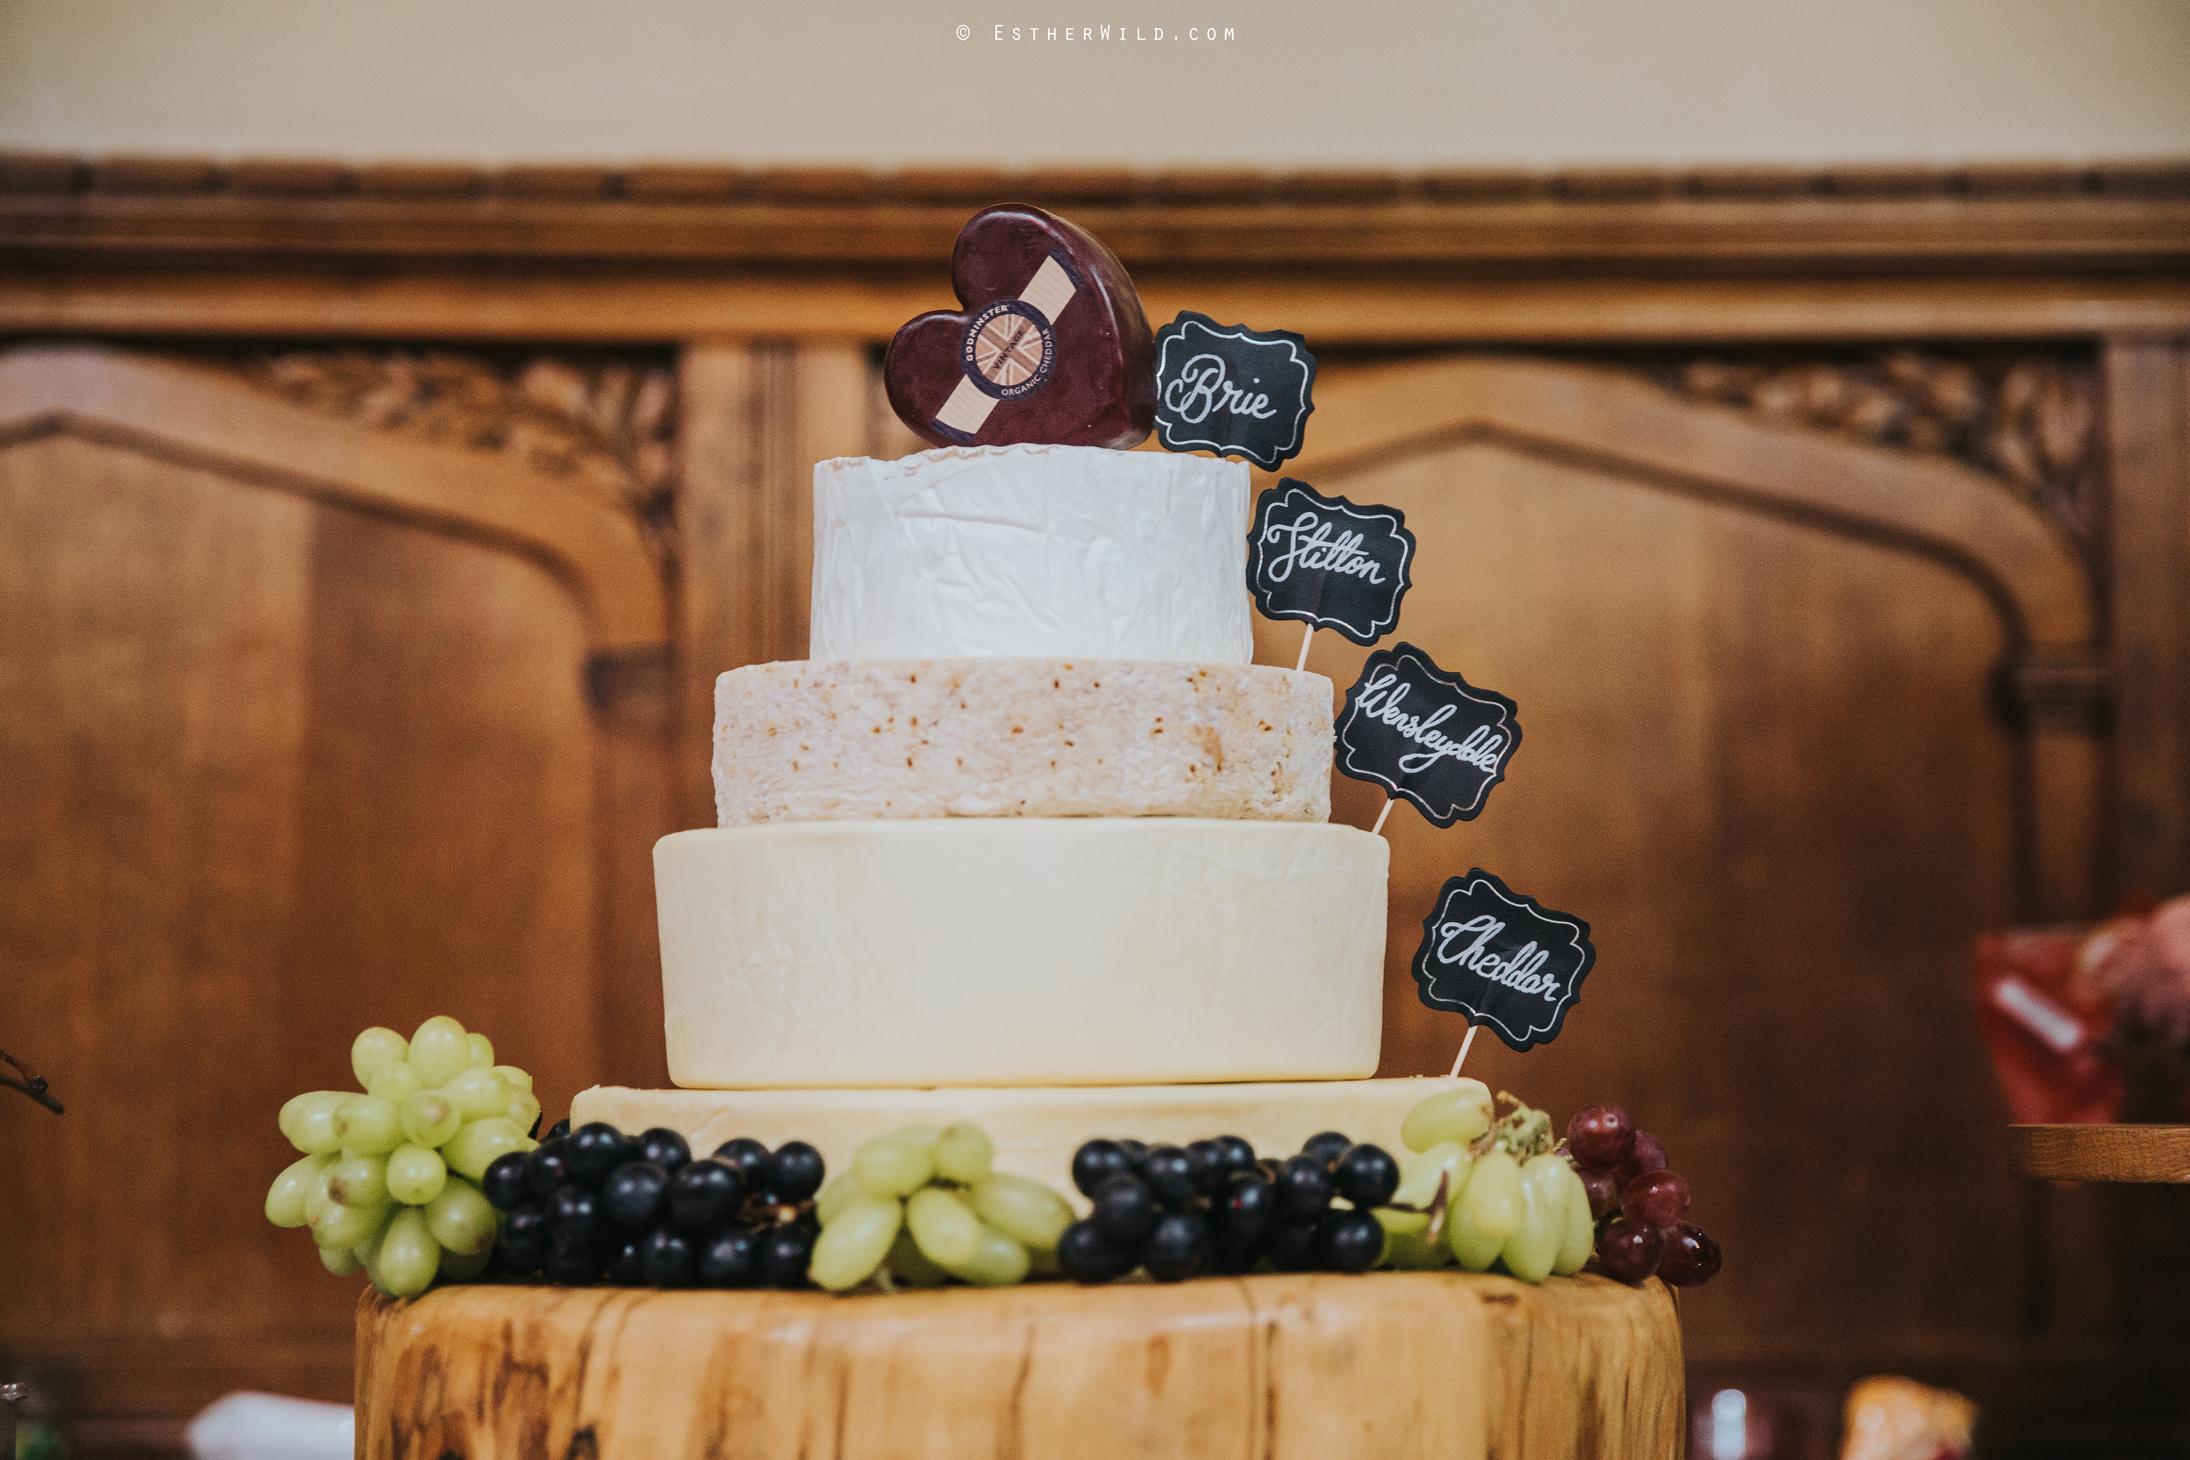 Wedding_Kings_Lynn_Town_Hall_Norfolk_Photographer_Esther_Wild_IMG_1802_IMGL0651.jpg